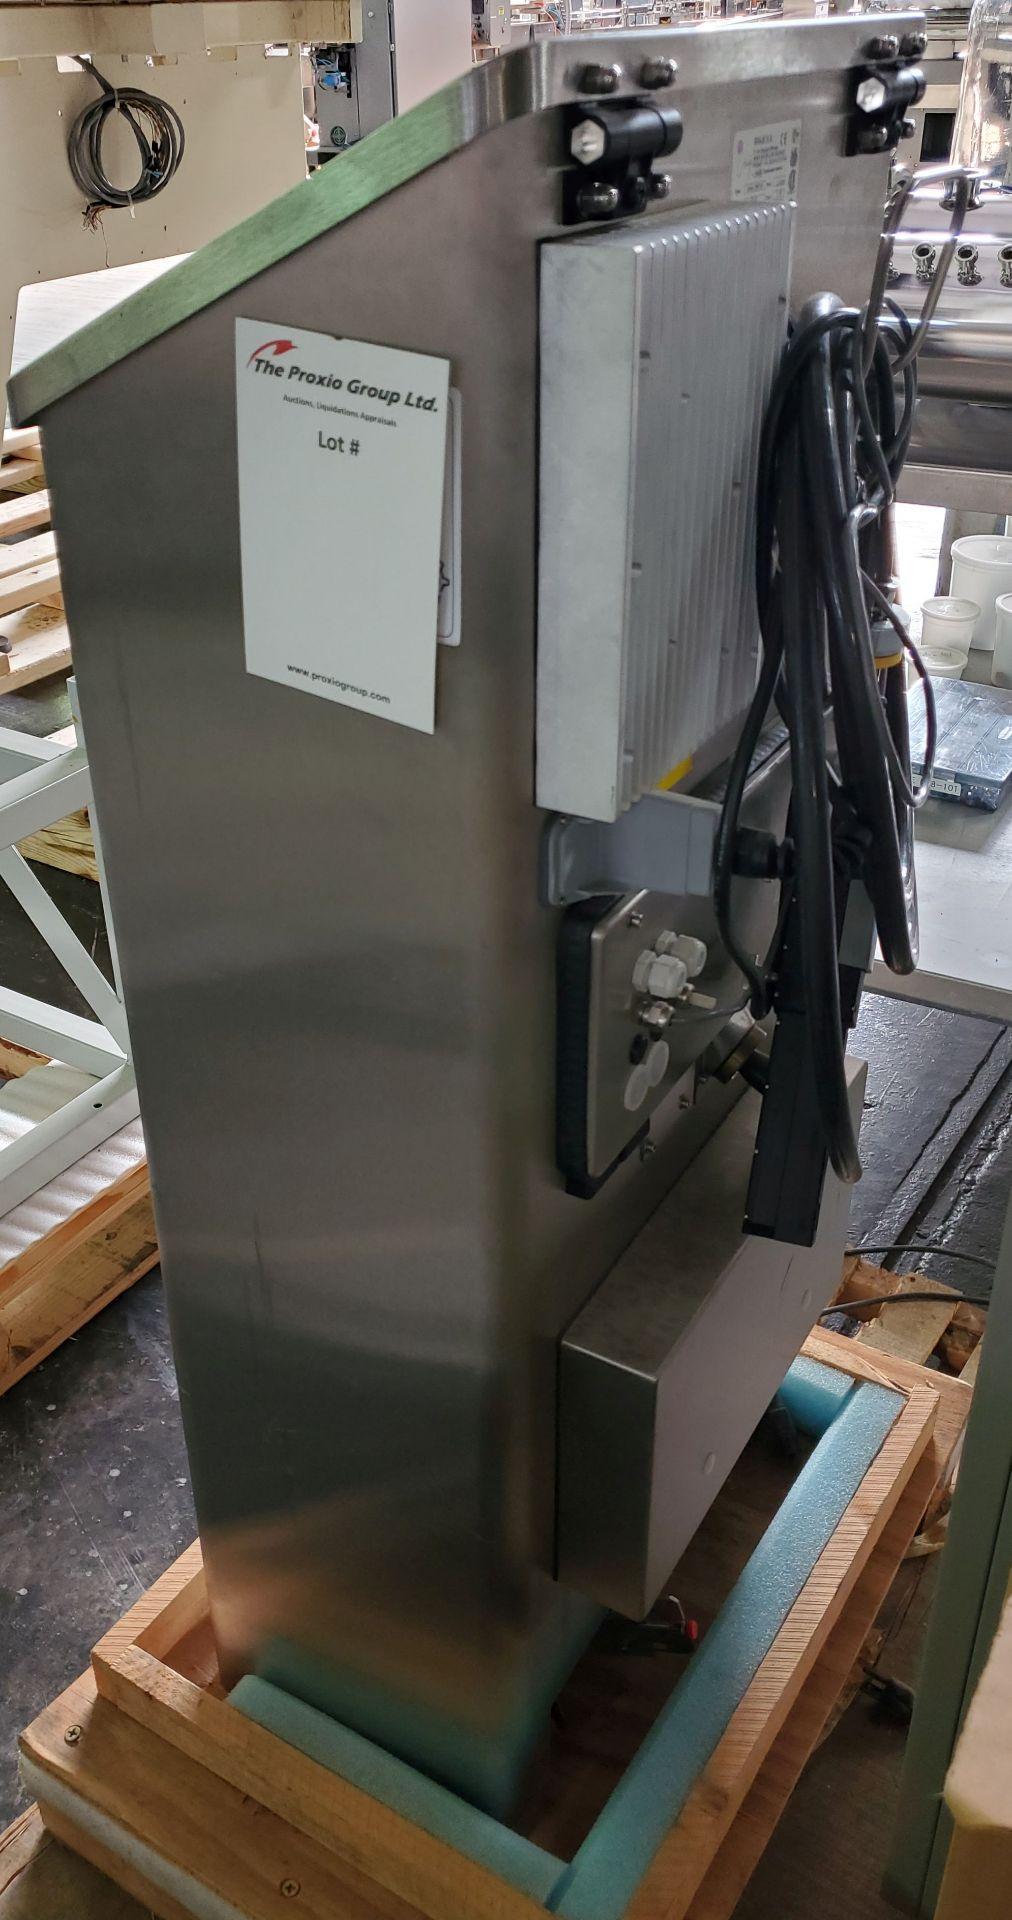 Lot 39 - Imaje Printer, type Jaime 1000S4plus, with printer head, 110 volts, serial# 7451R7, built 1997.